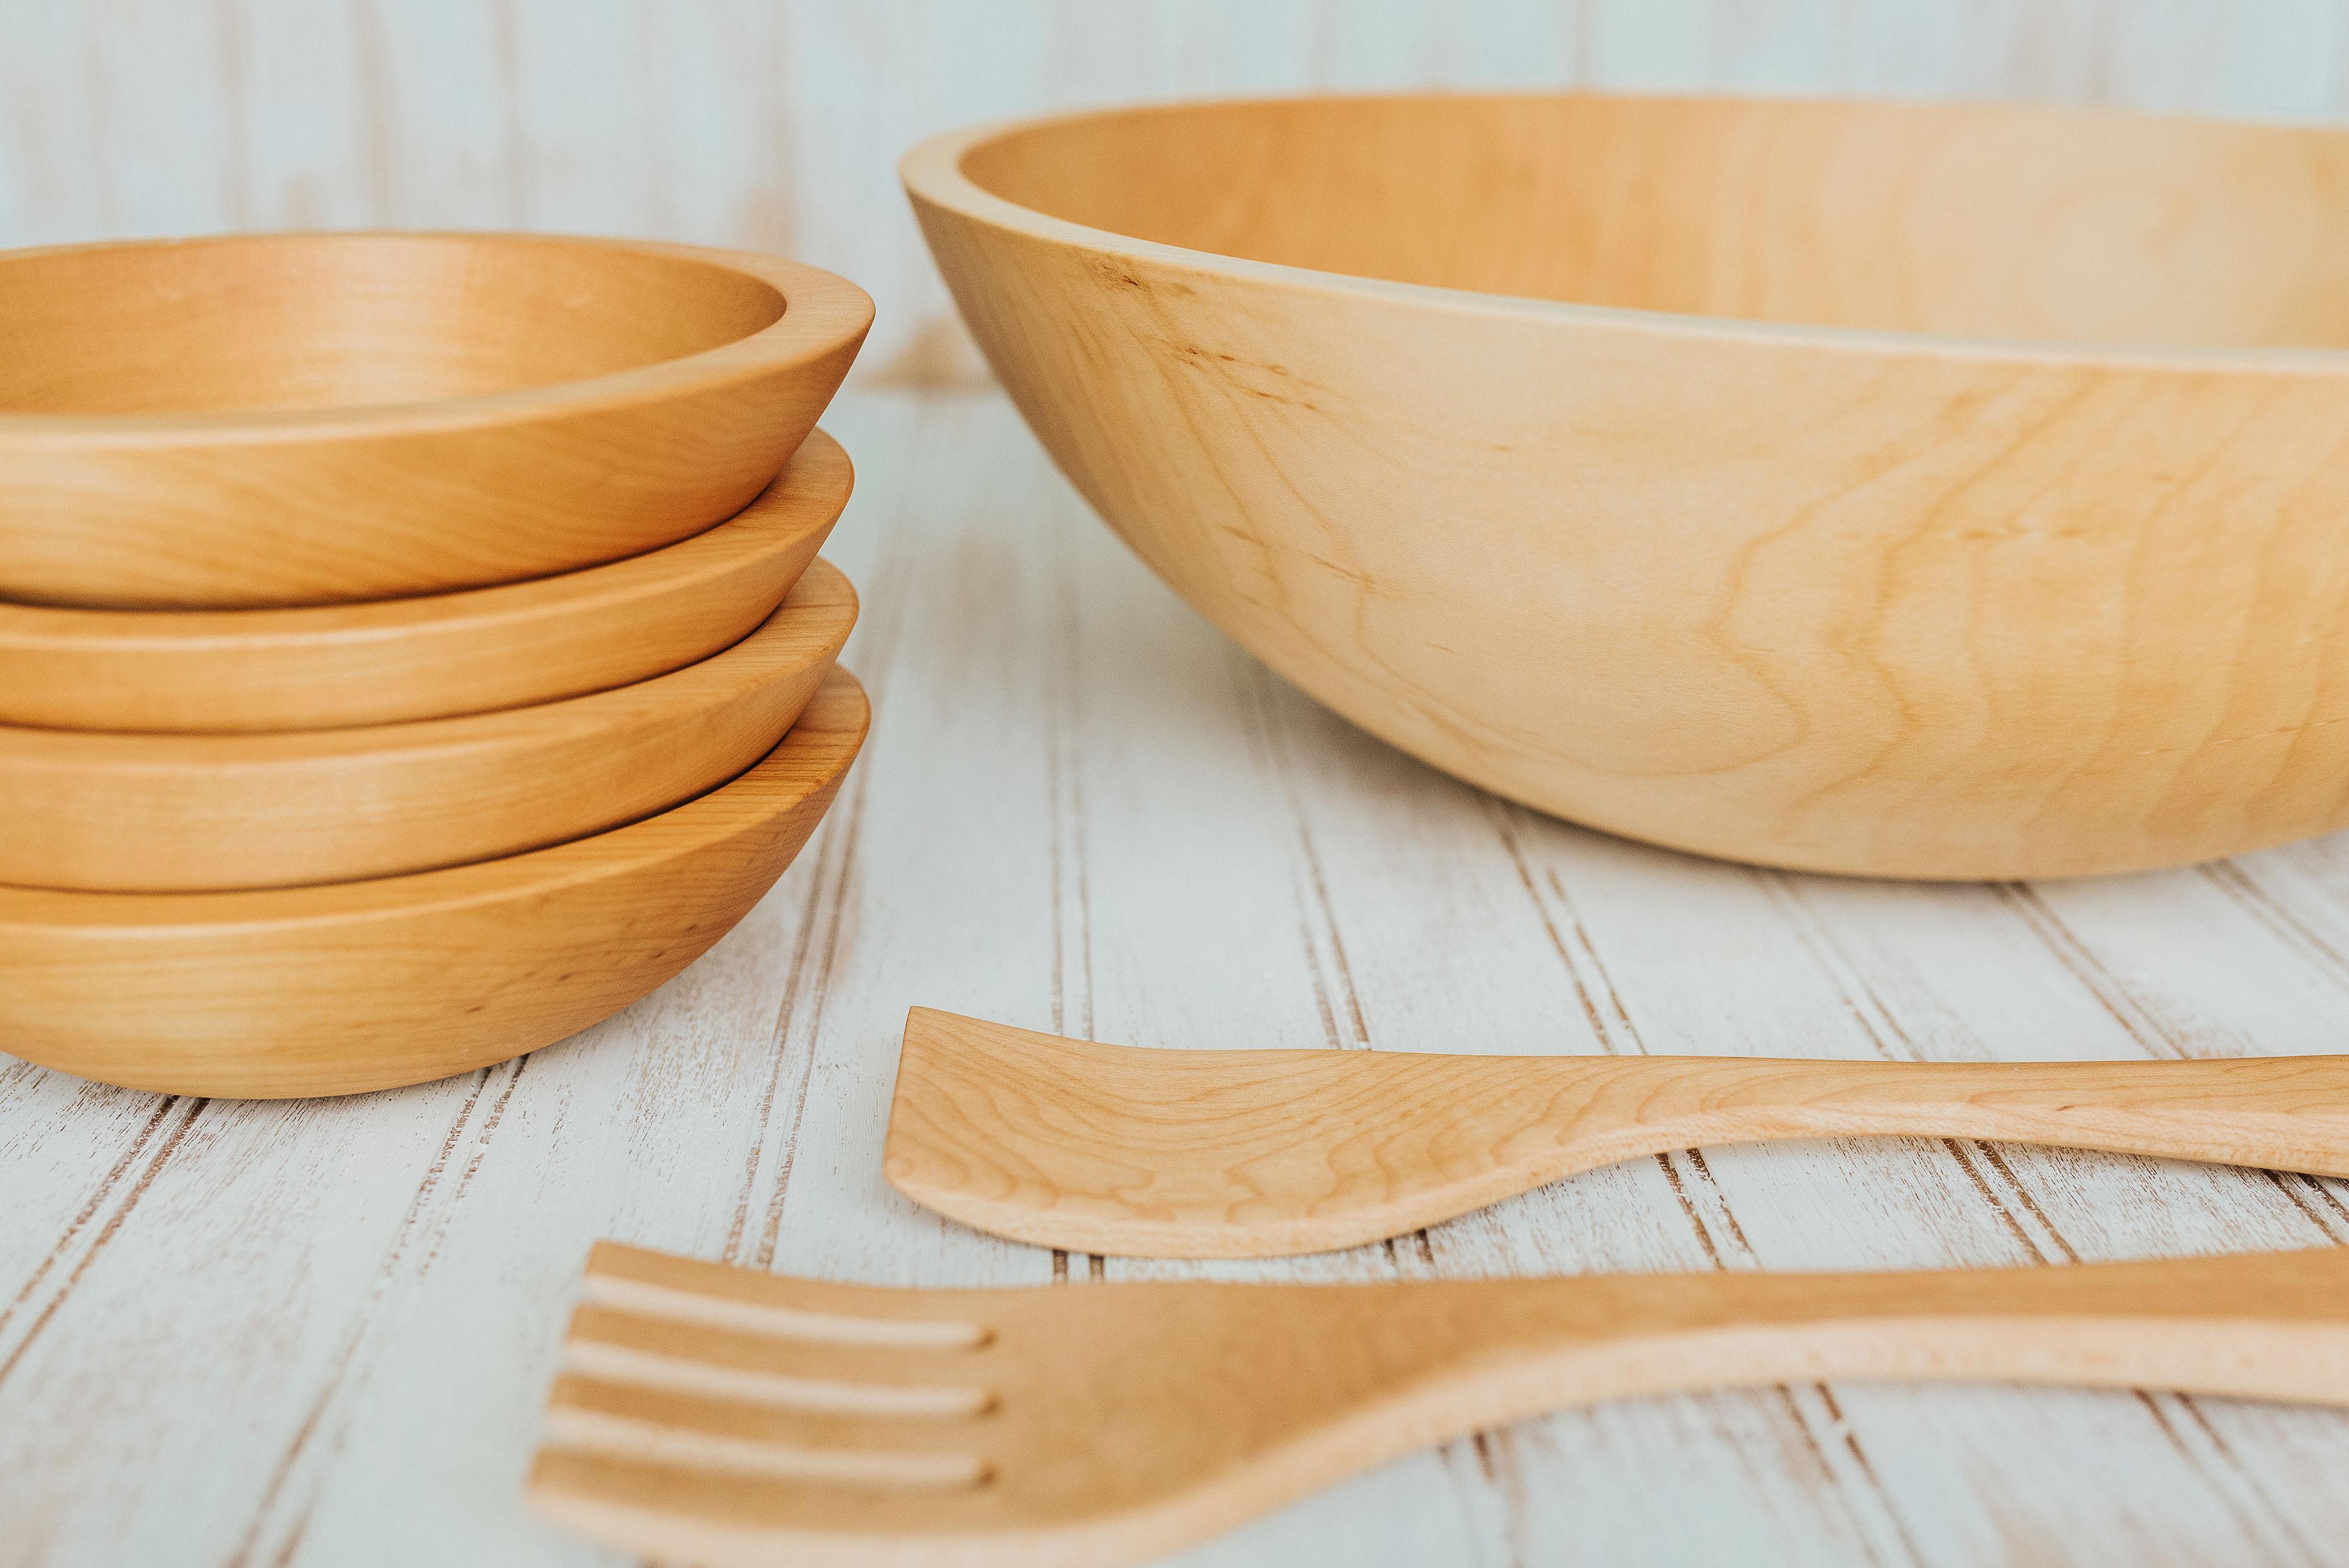 Wood Salad Bowl Set 5 Bowl Maple Wood Set With Salad Servers